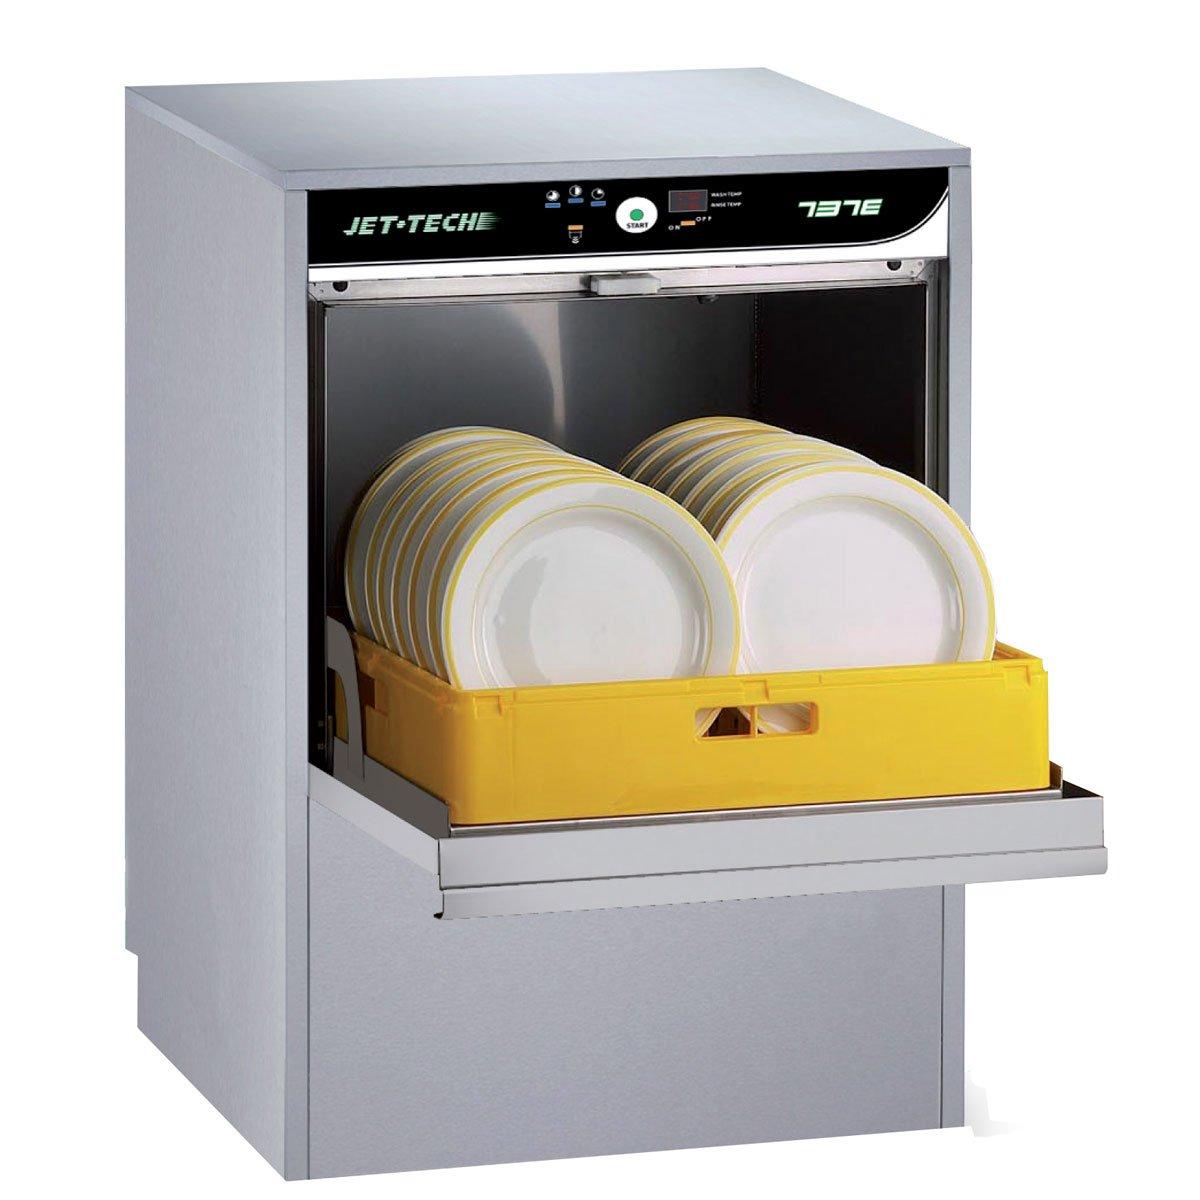 Jet-Tech - Dishwasher, Undercounter High Temp. - 208V - 737E